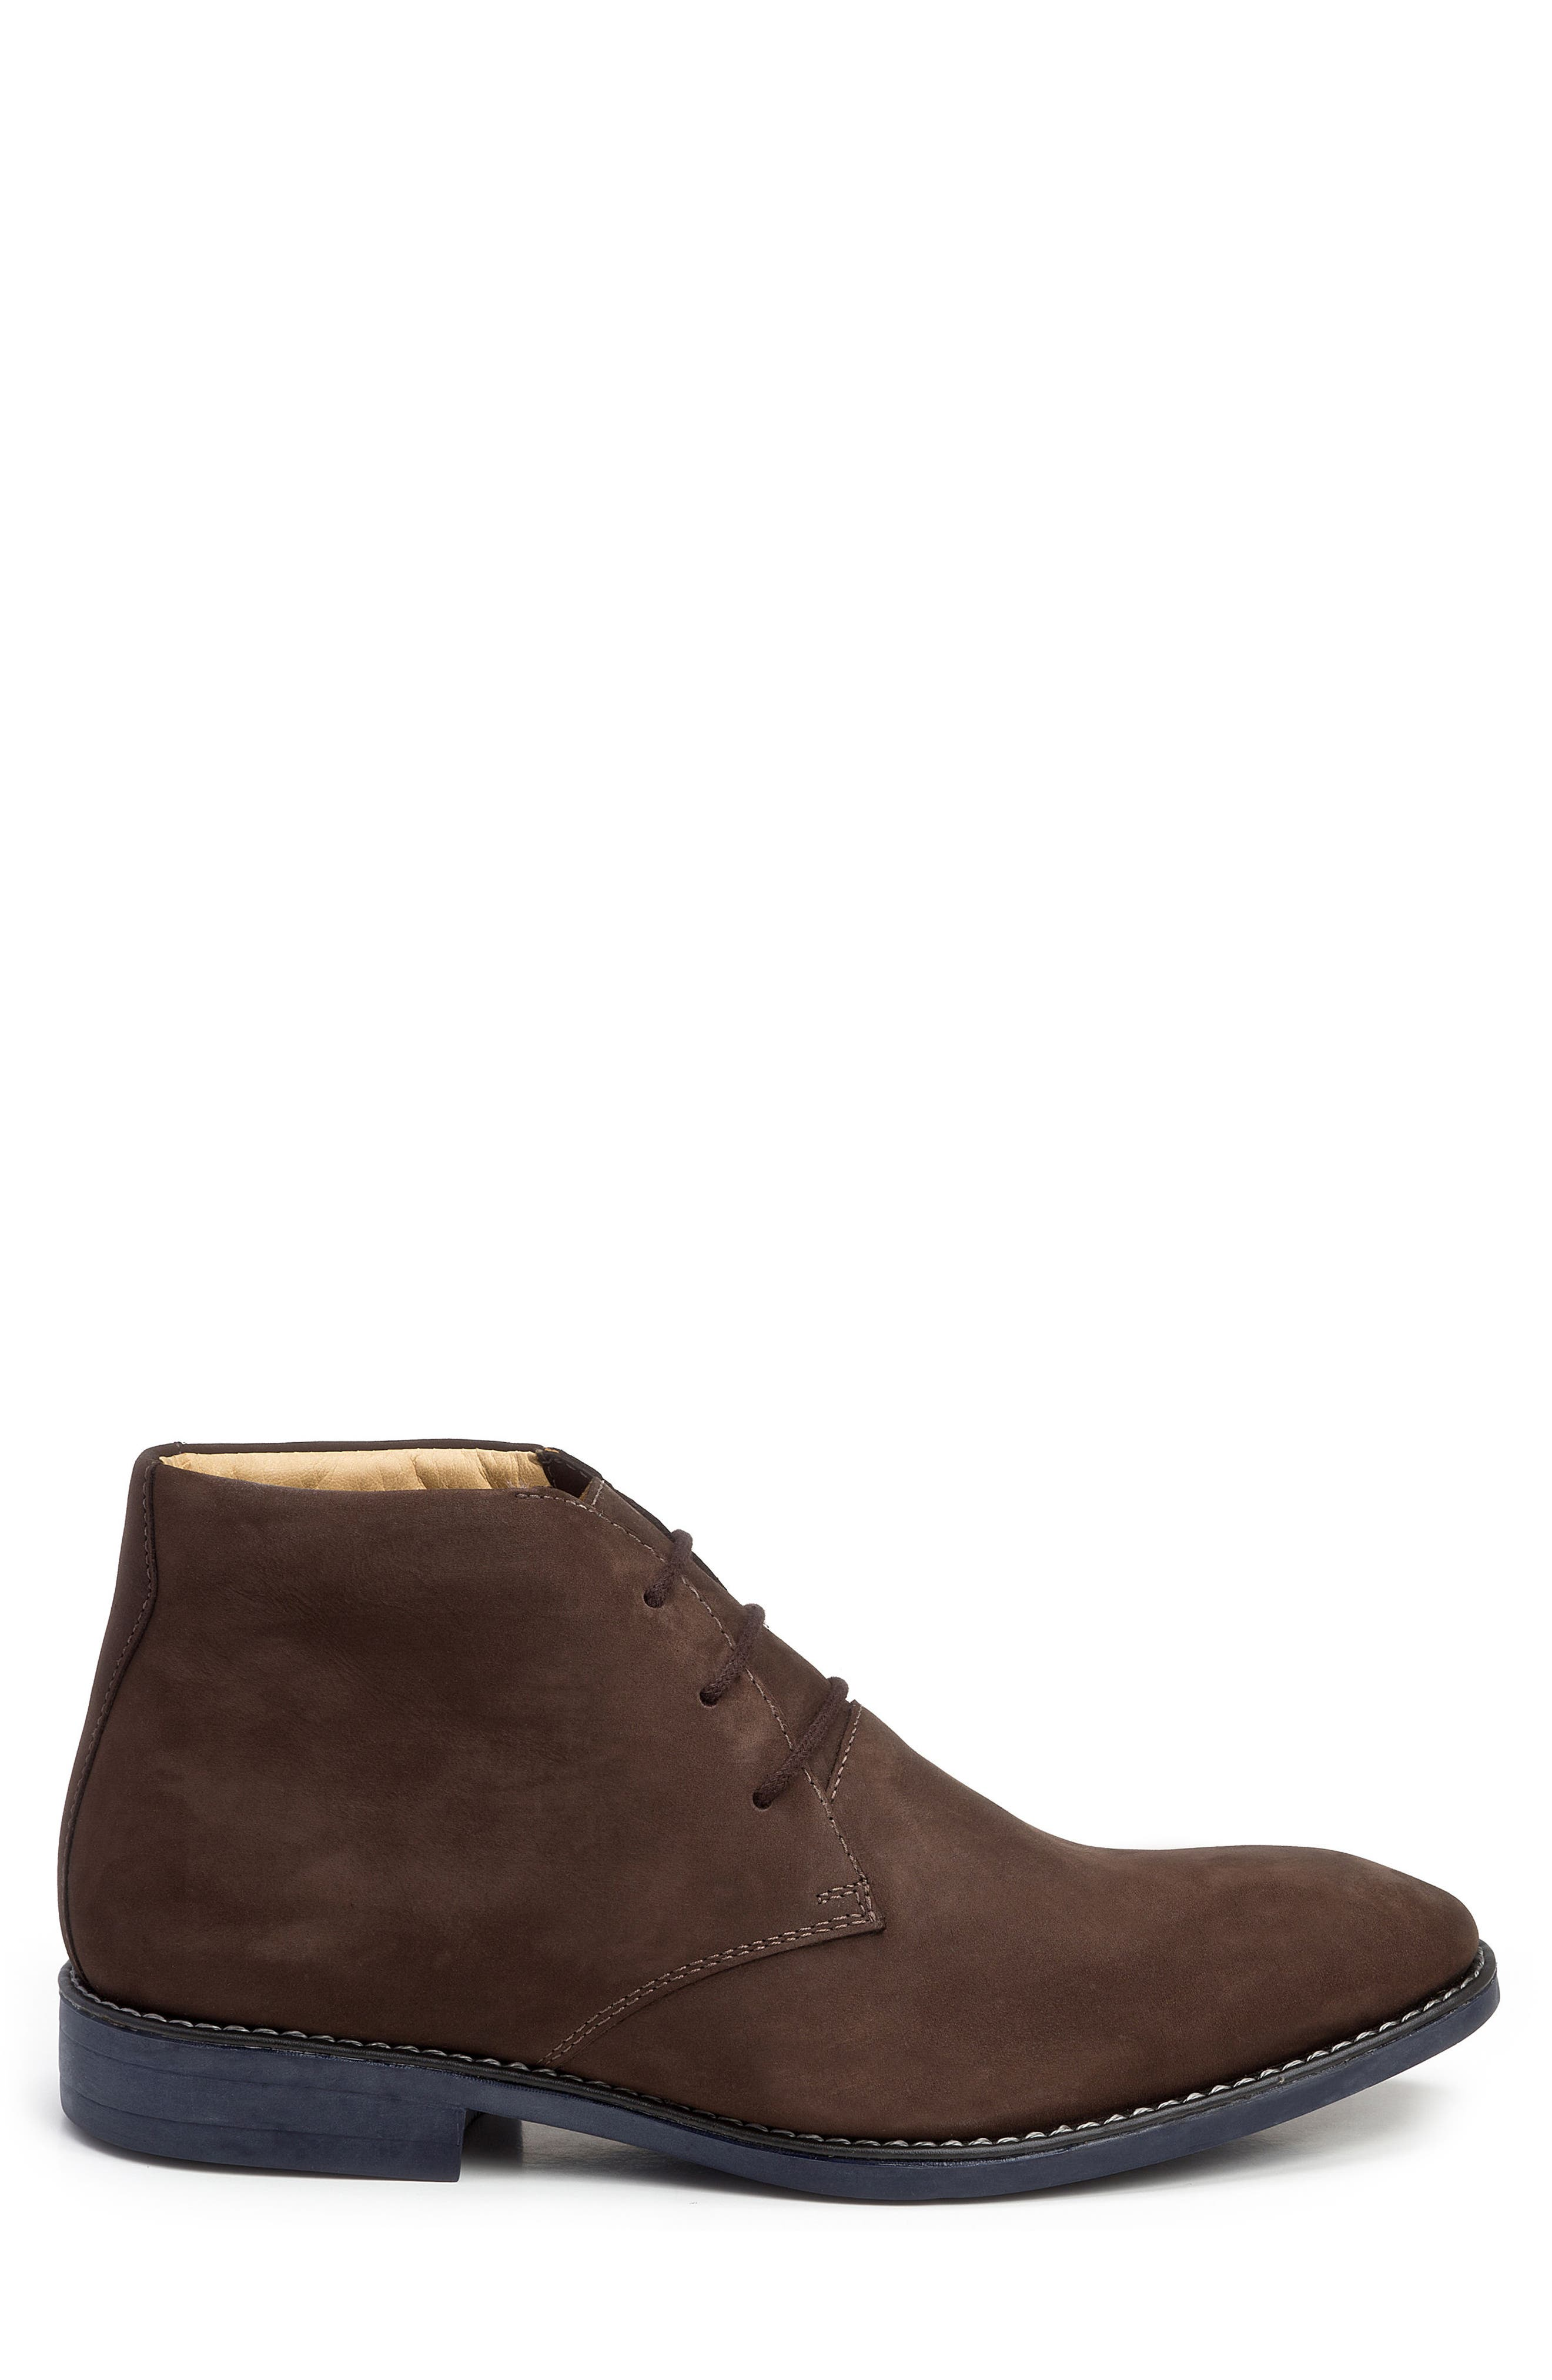 Nick Chukka Boot,                             Alternate thumbnail 3, color,                             Brown Nubuck Leather